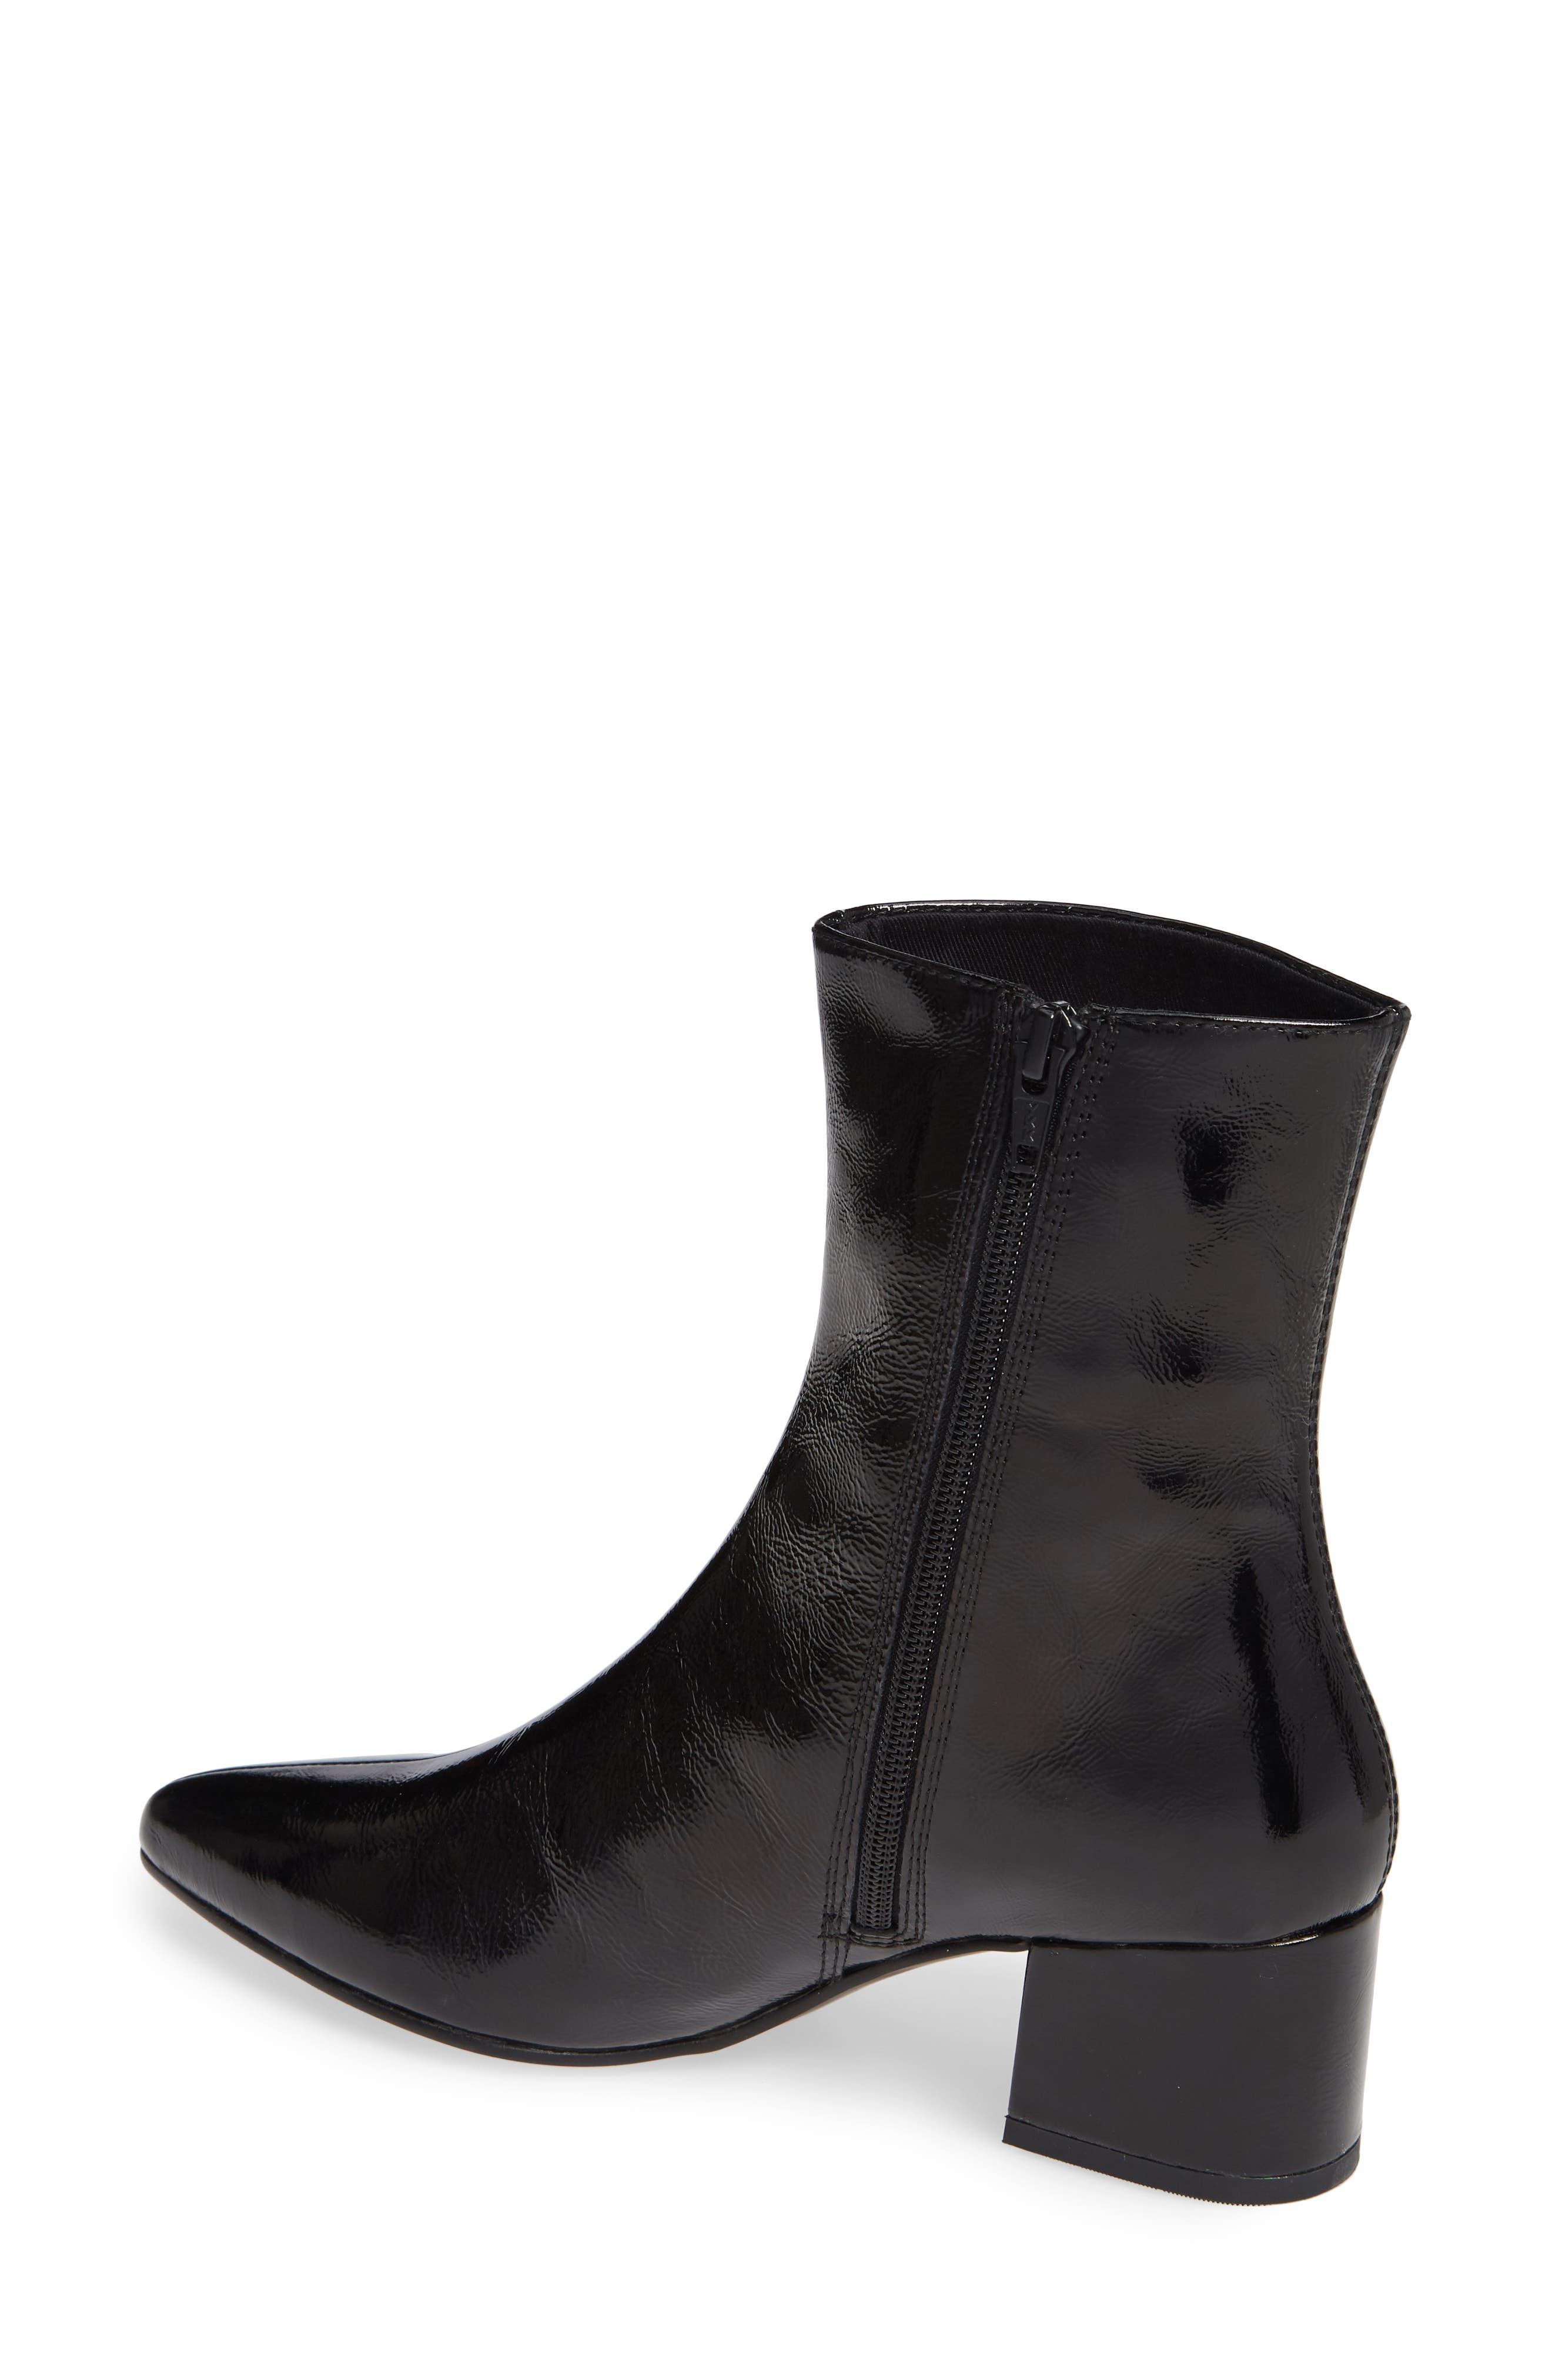 5bcba532ea437 patent leather boot